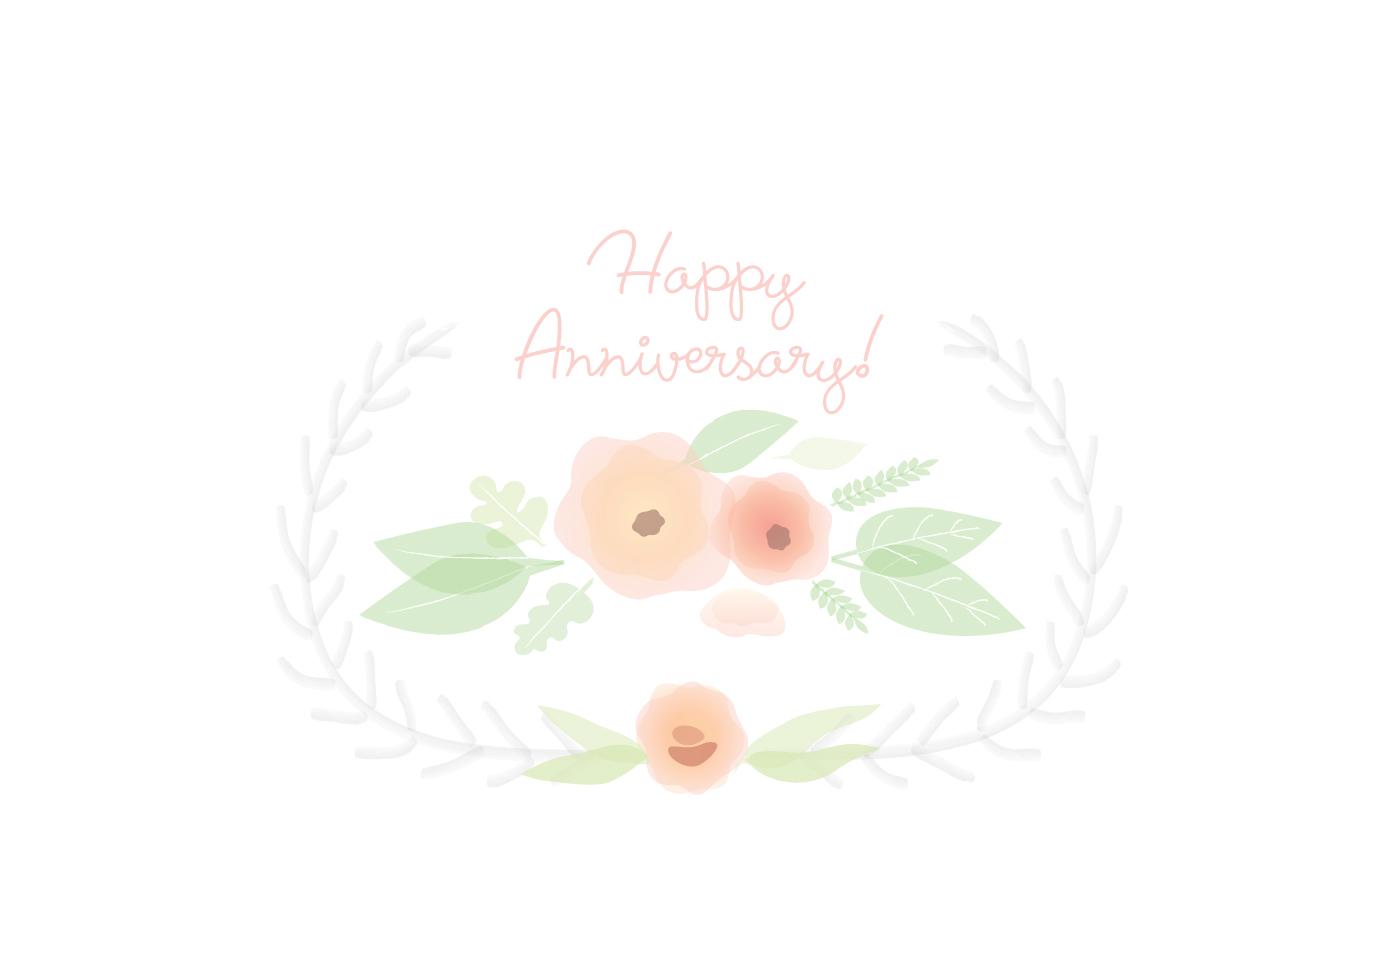 flower card illustration  download free vectors clipart